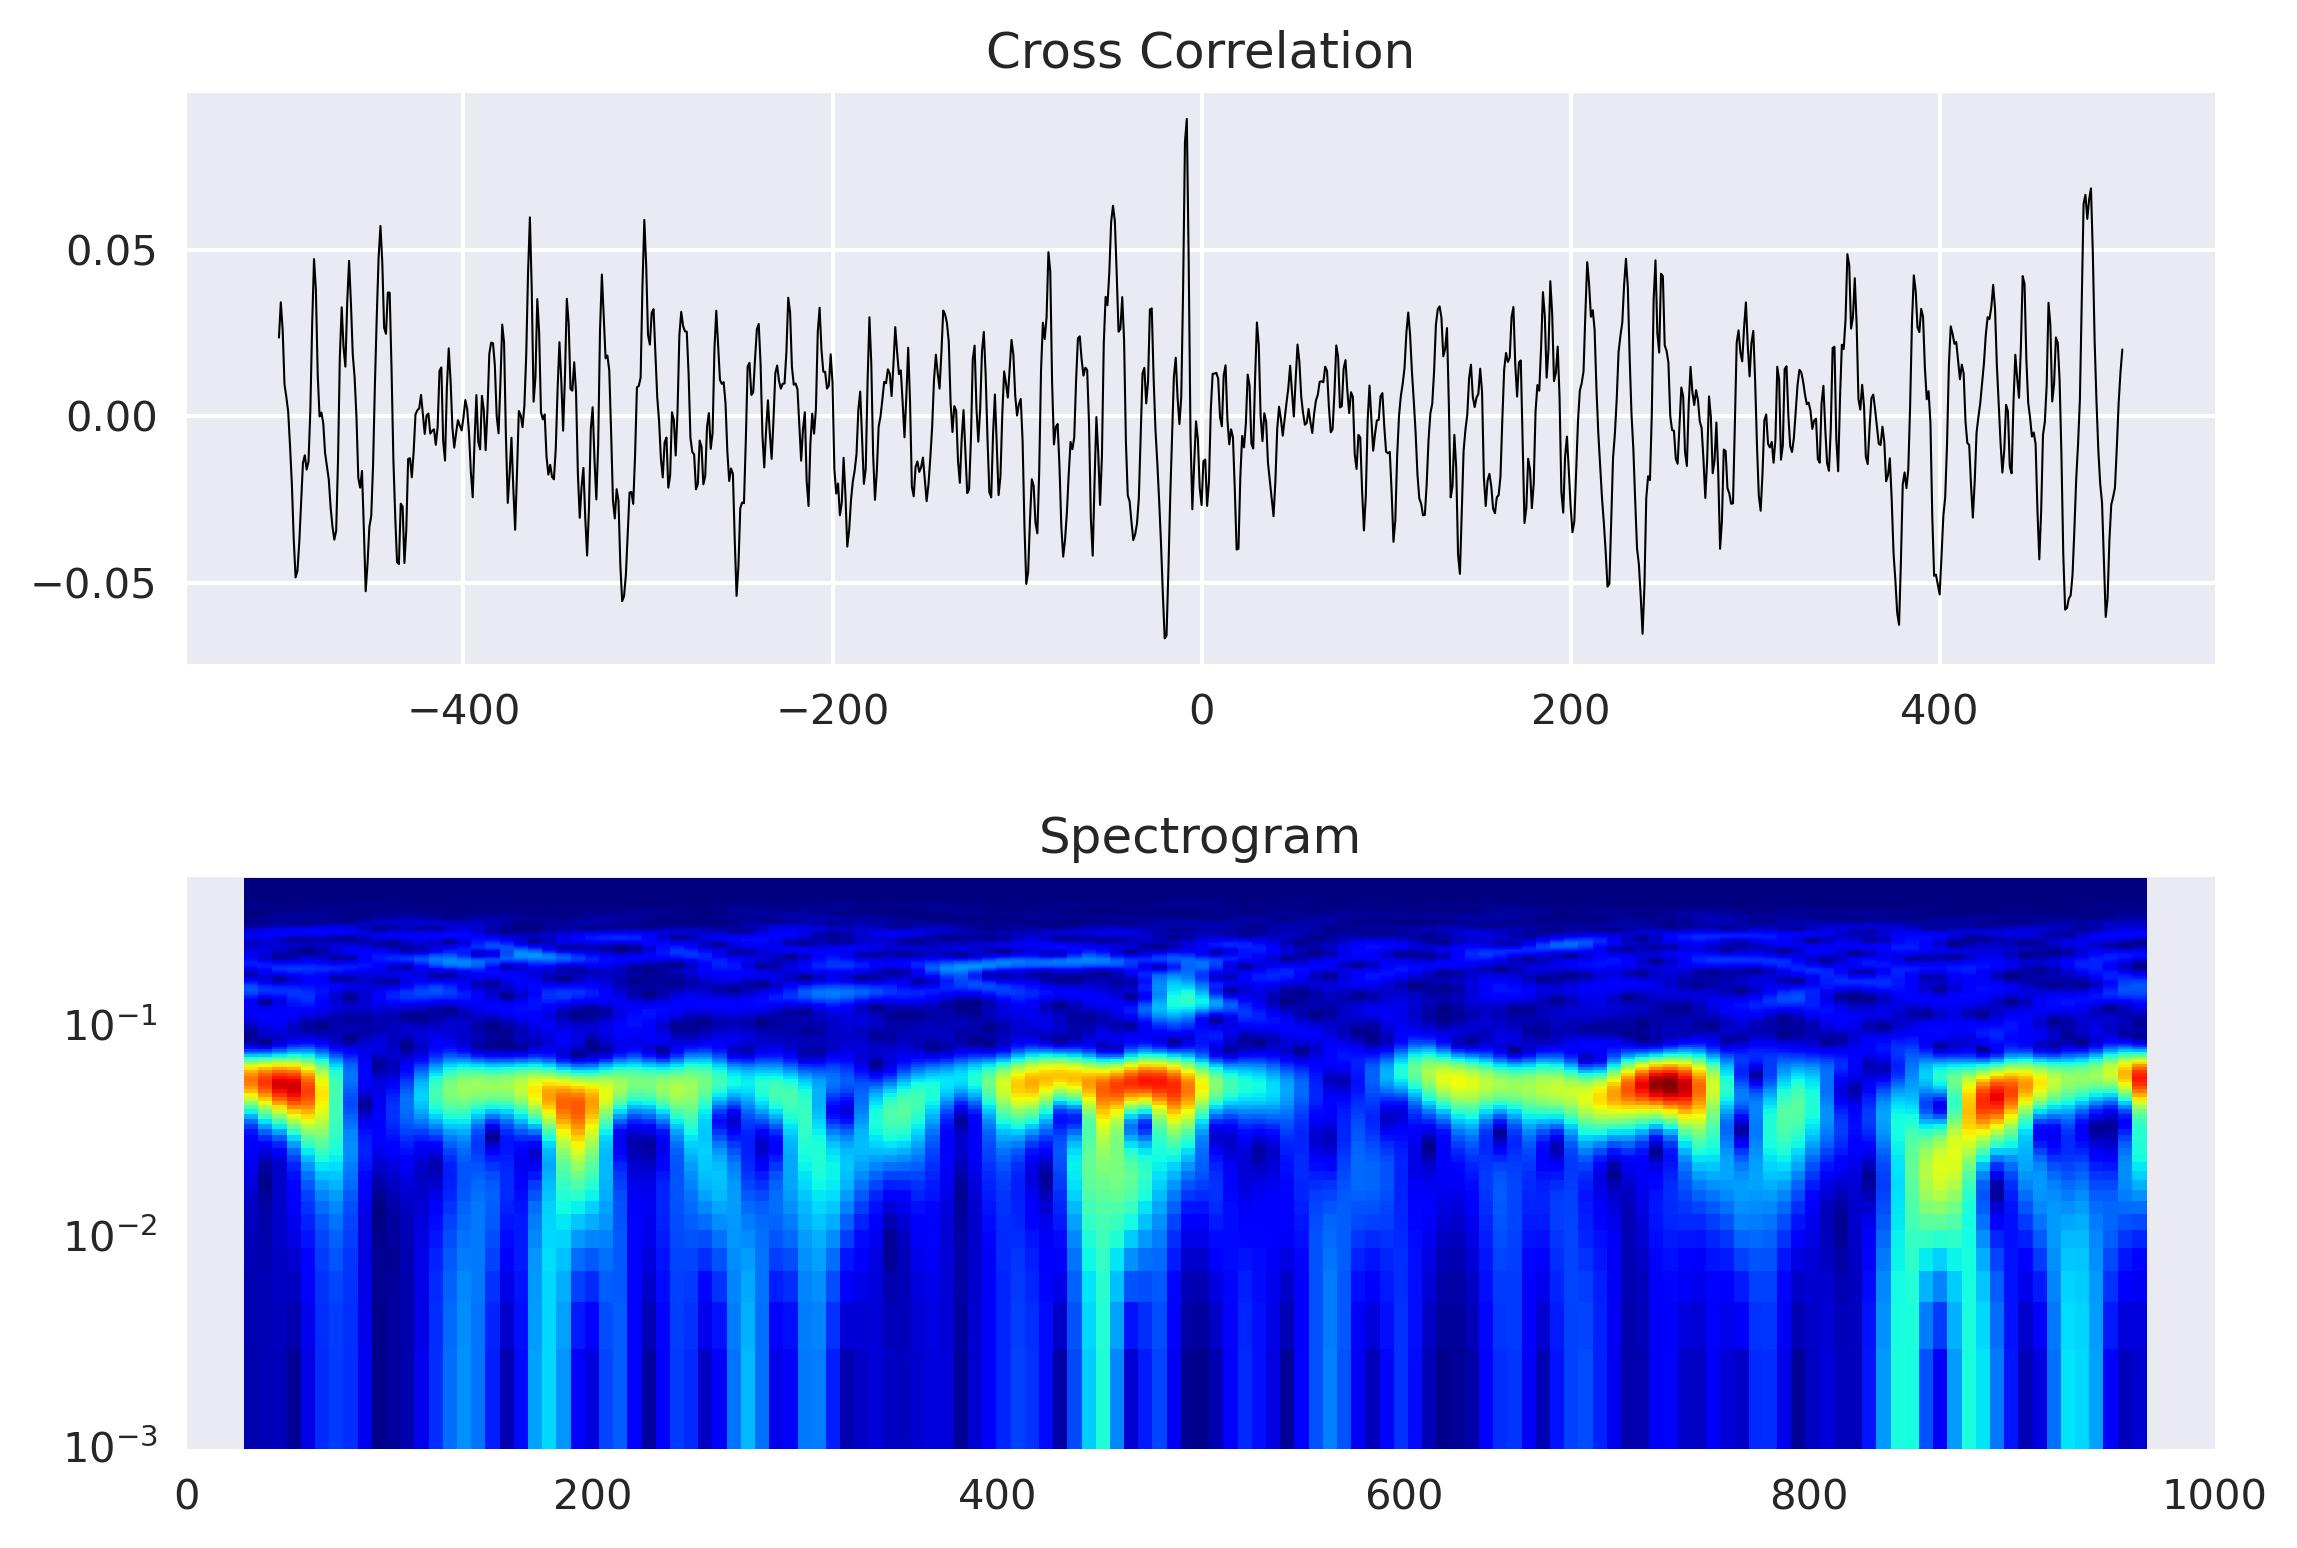 Spectrogram plot of the time series